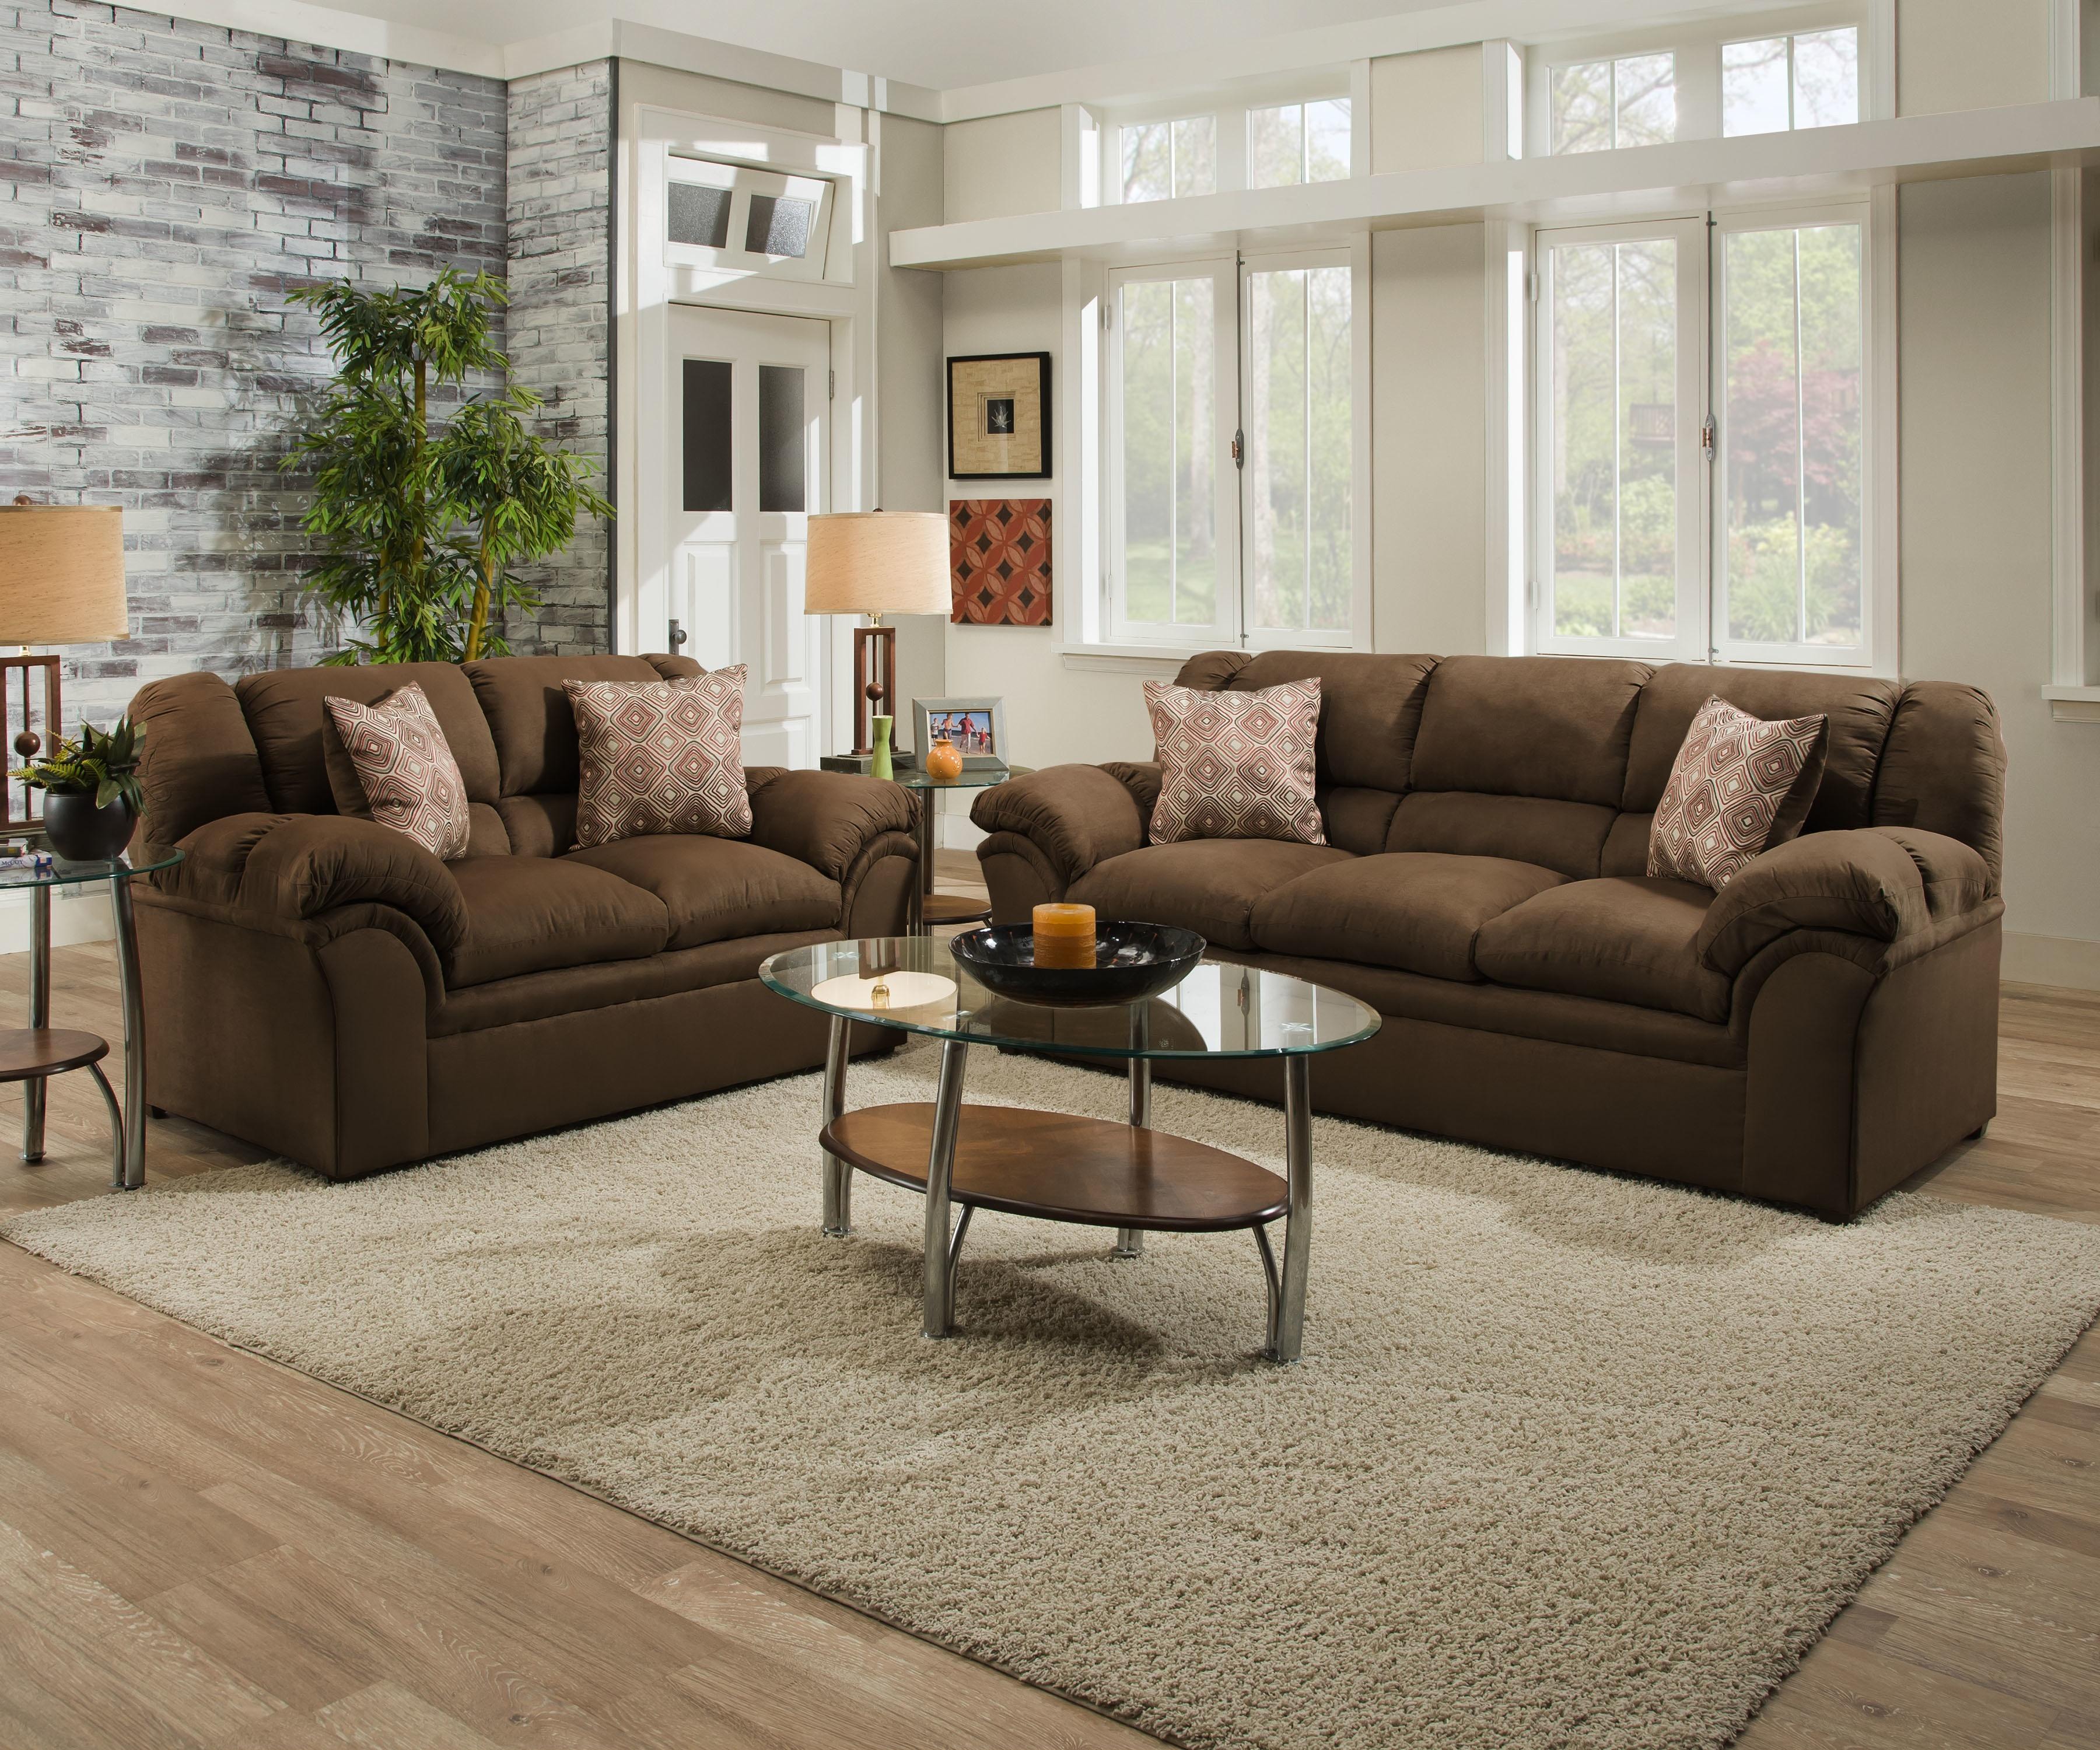 Fresh eurodesign brown leather 5 piece sectional sofa set for Eurodesign brown leather 5 piece sectional sofa set